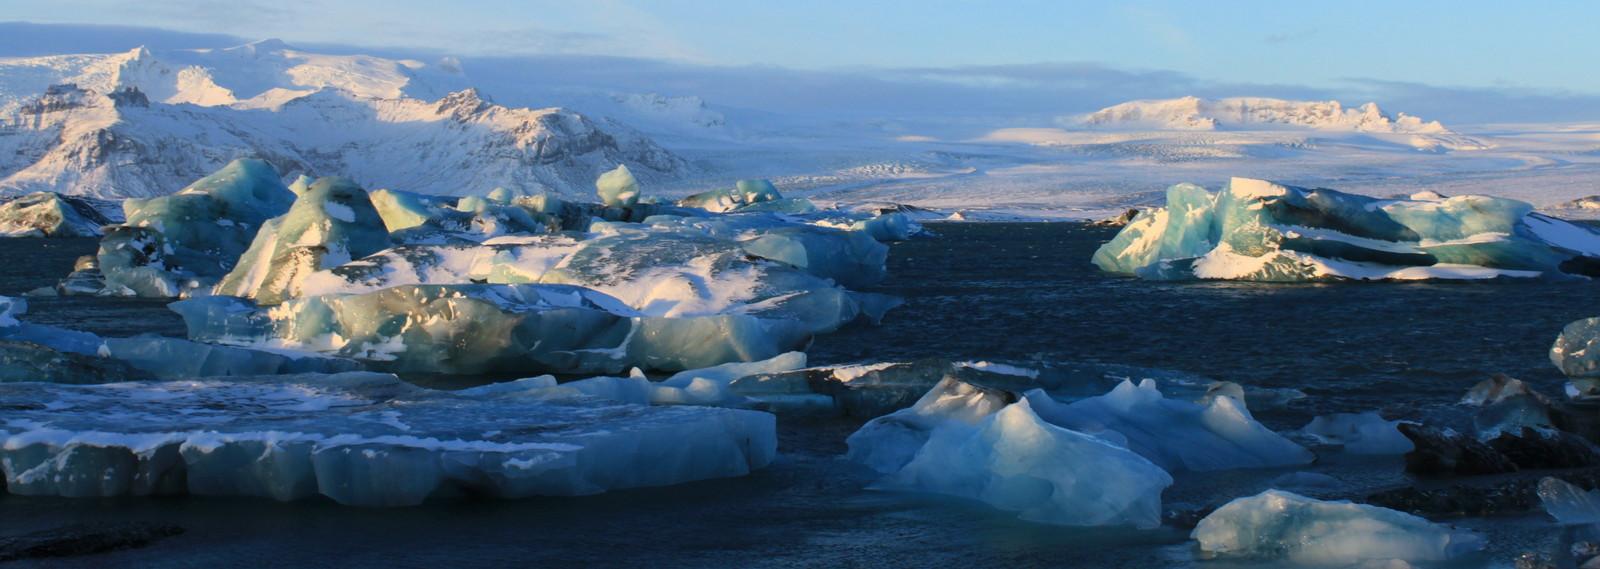 temperatuur ijsland nu